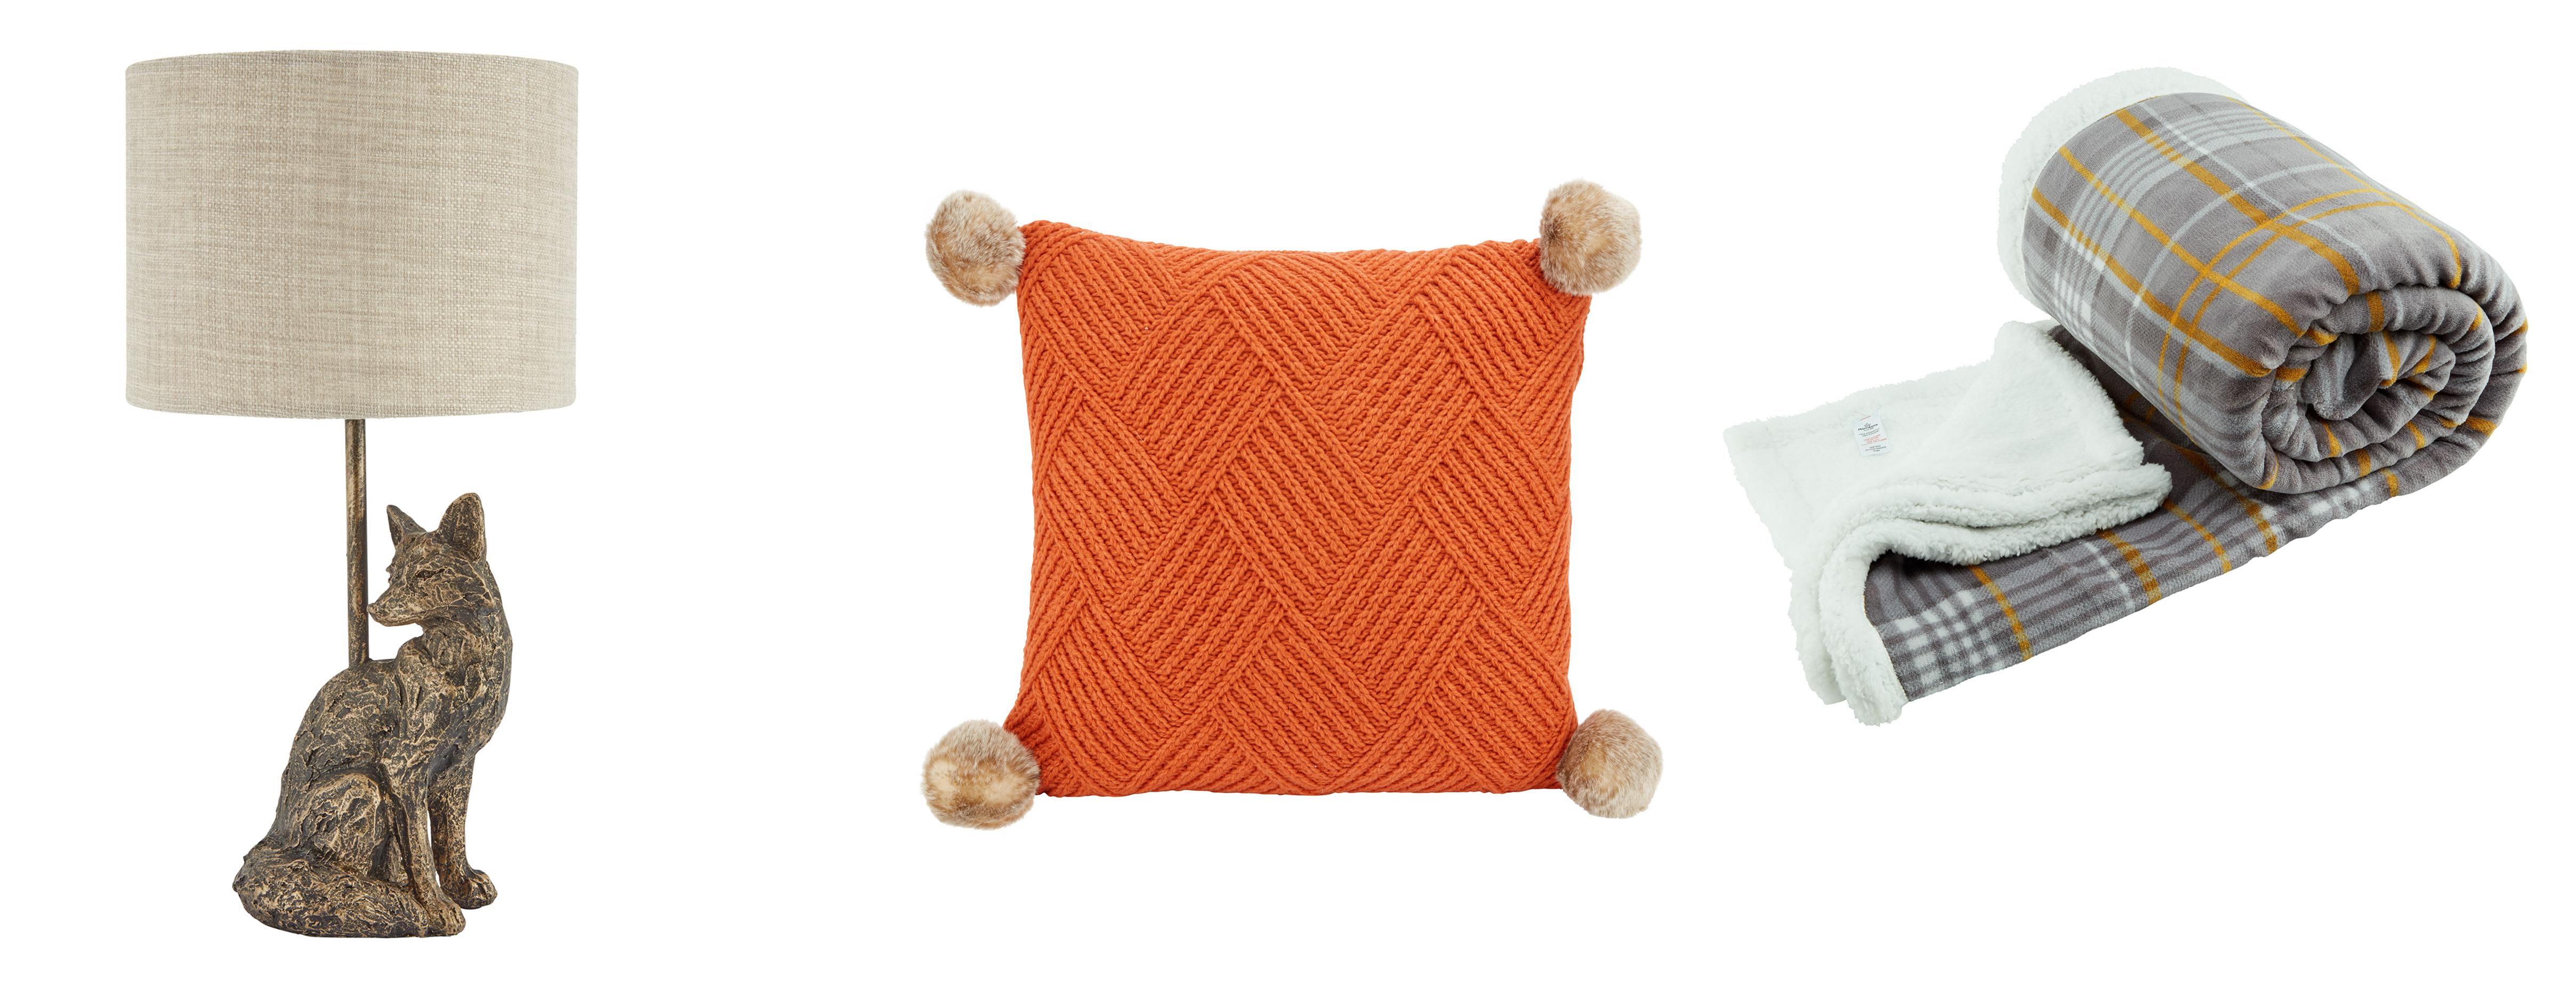 (L-R) Morrisons Ochre Birdy Fox Table Lamp, £17; Morrisons Century Studio Orange Knit Cushion, !2; Morrisons Ochre Birdy Country Check Throw, £18 (Morrisons/PA)